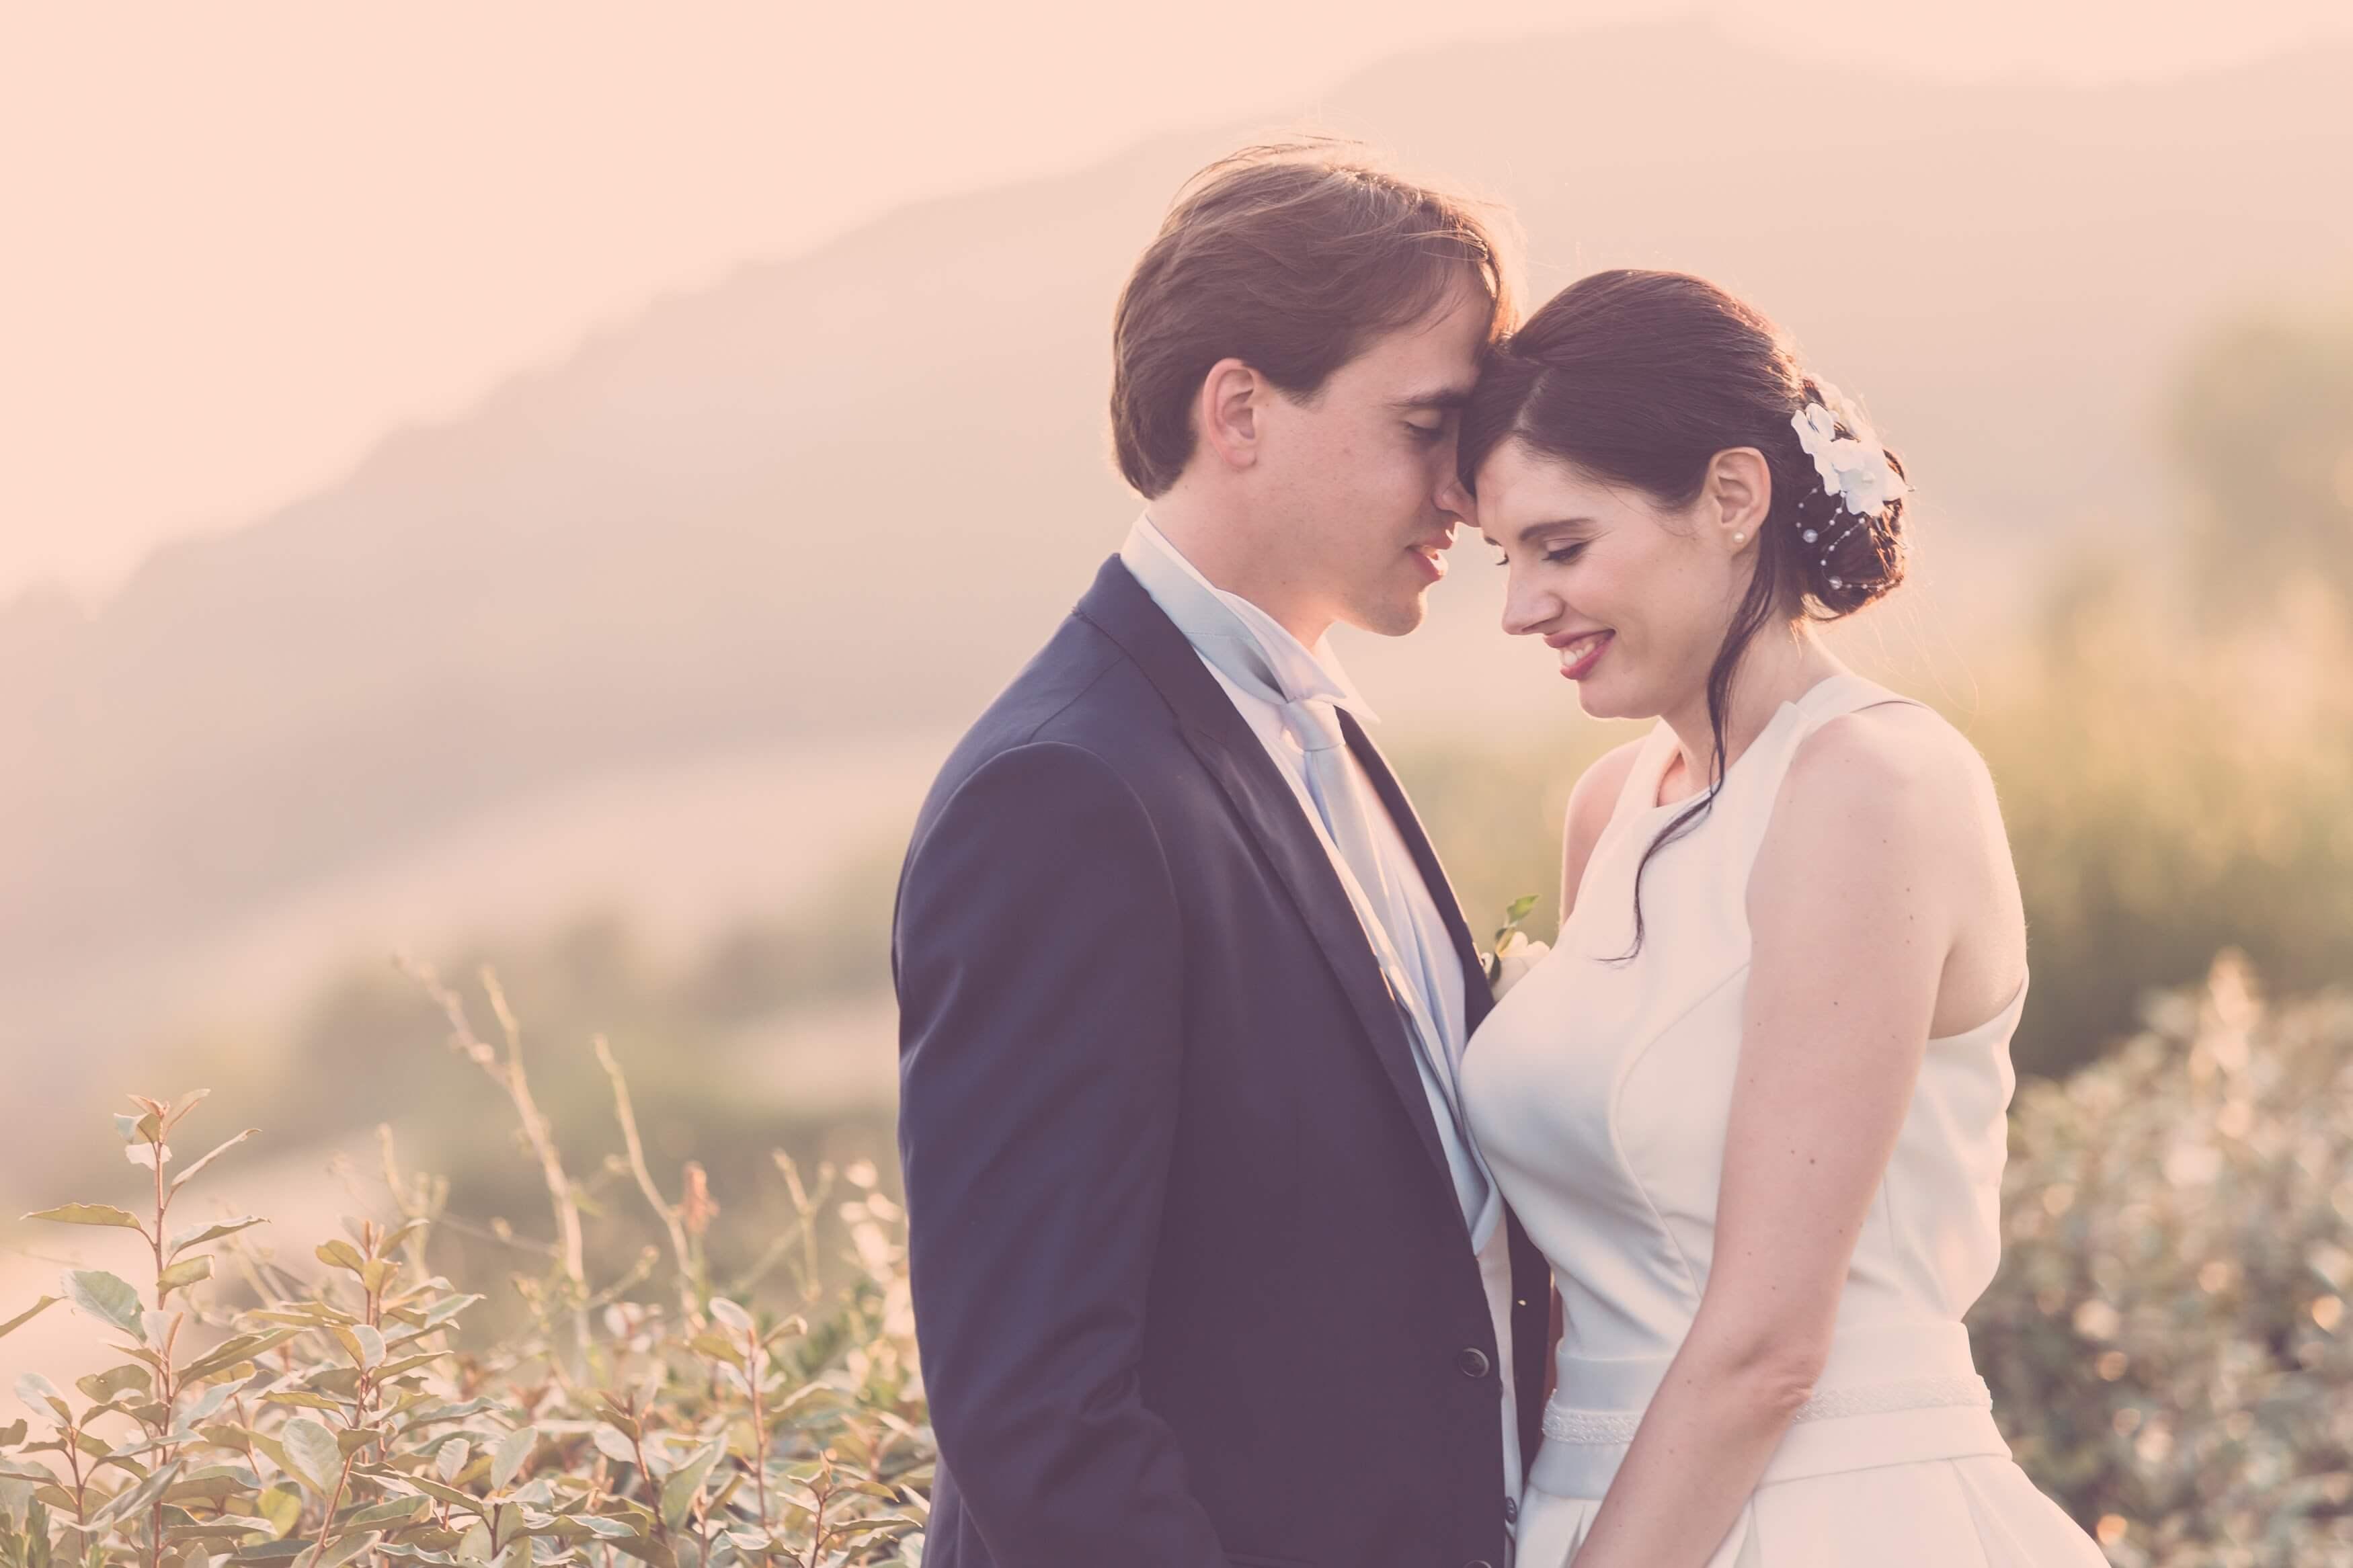 Matrimonio S&J - Tenuta Quadrifoglio - Toscana